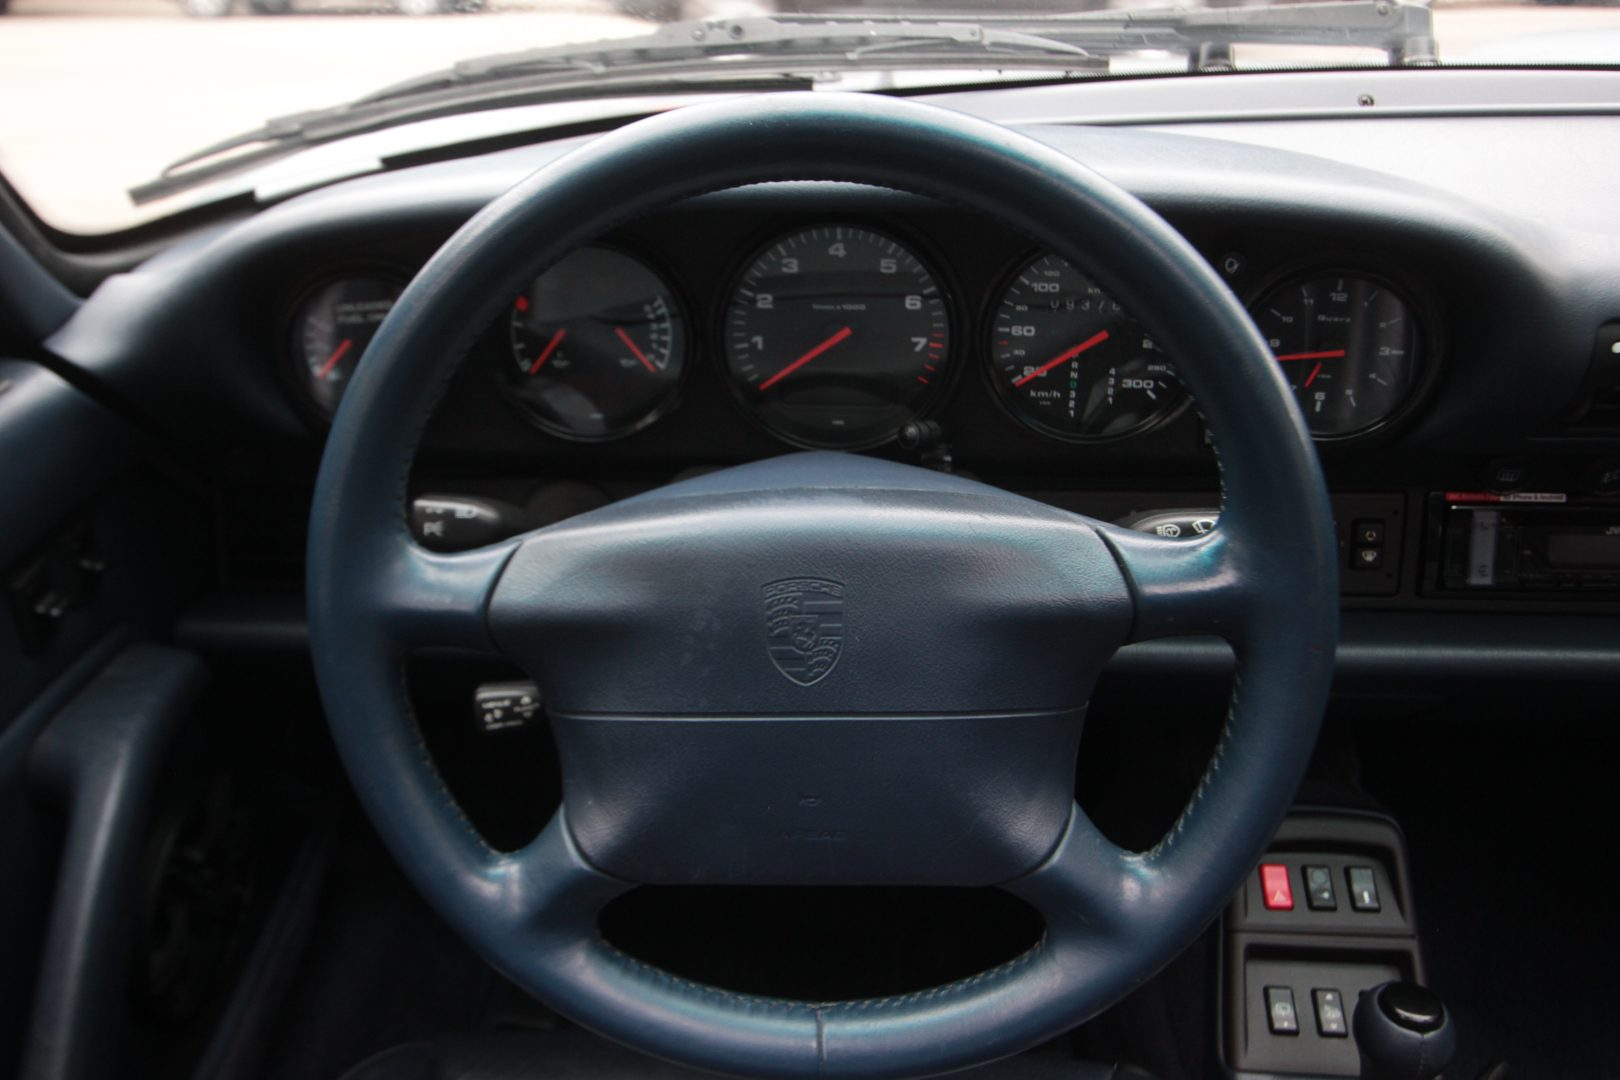 AIL Porsche 993 Carrera C2 3.6 Tiptronic 1